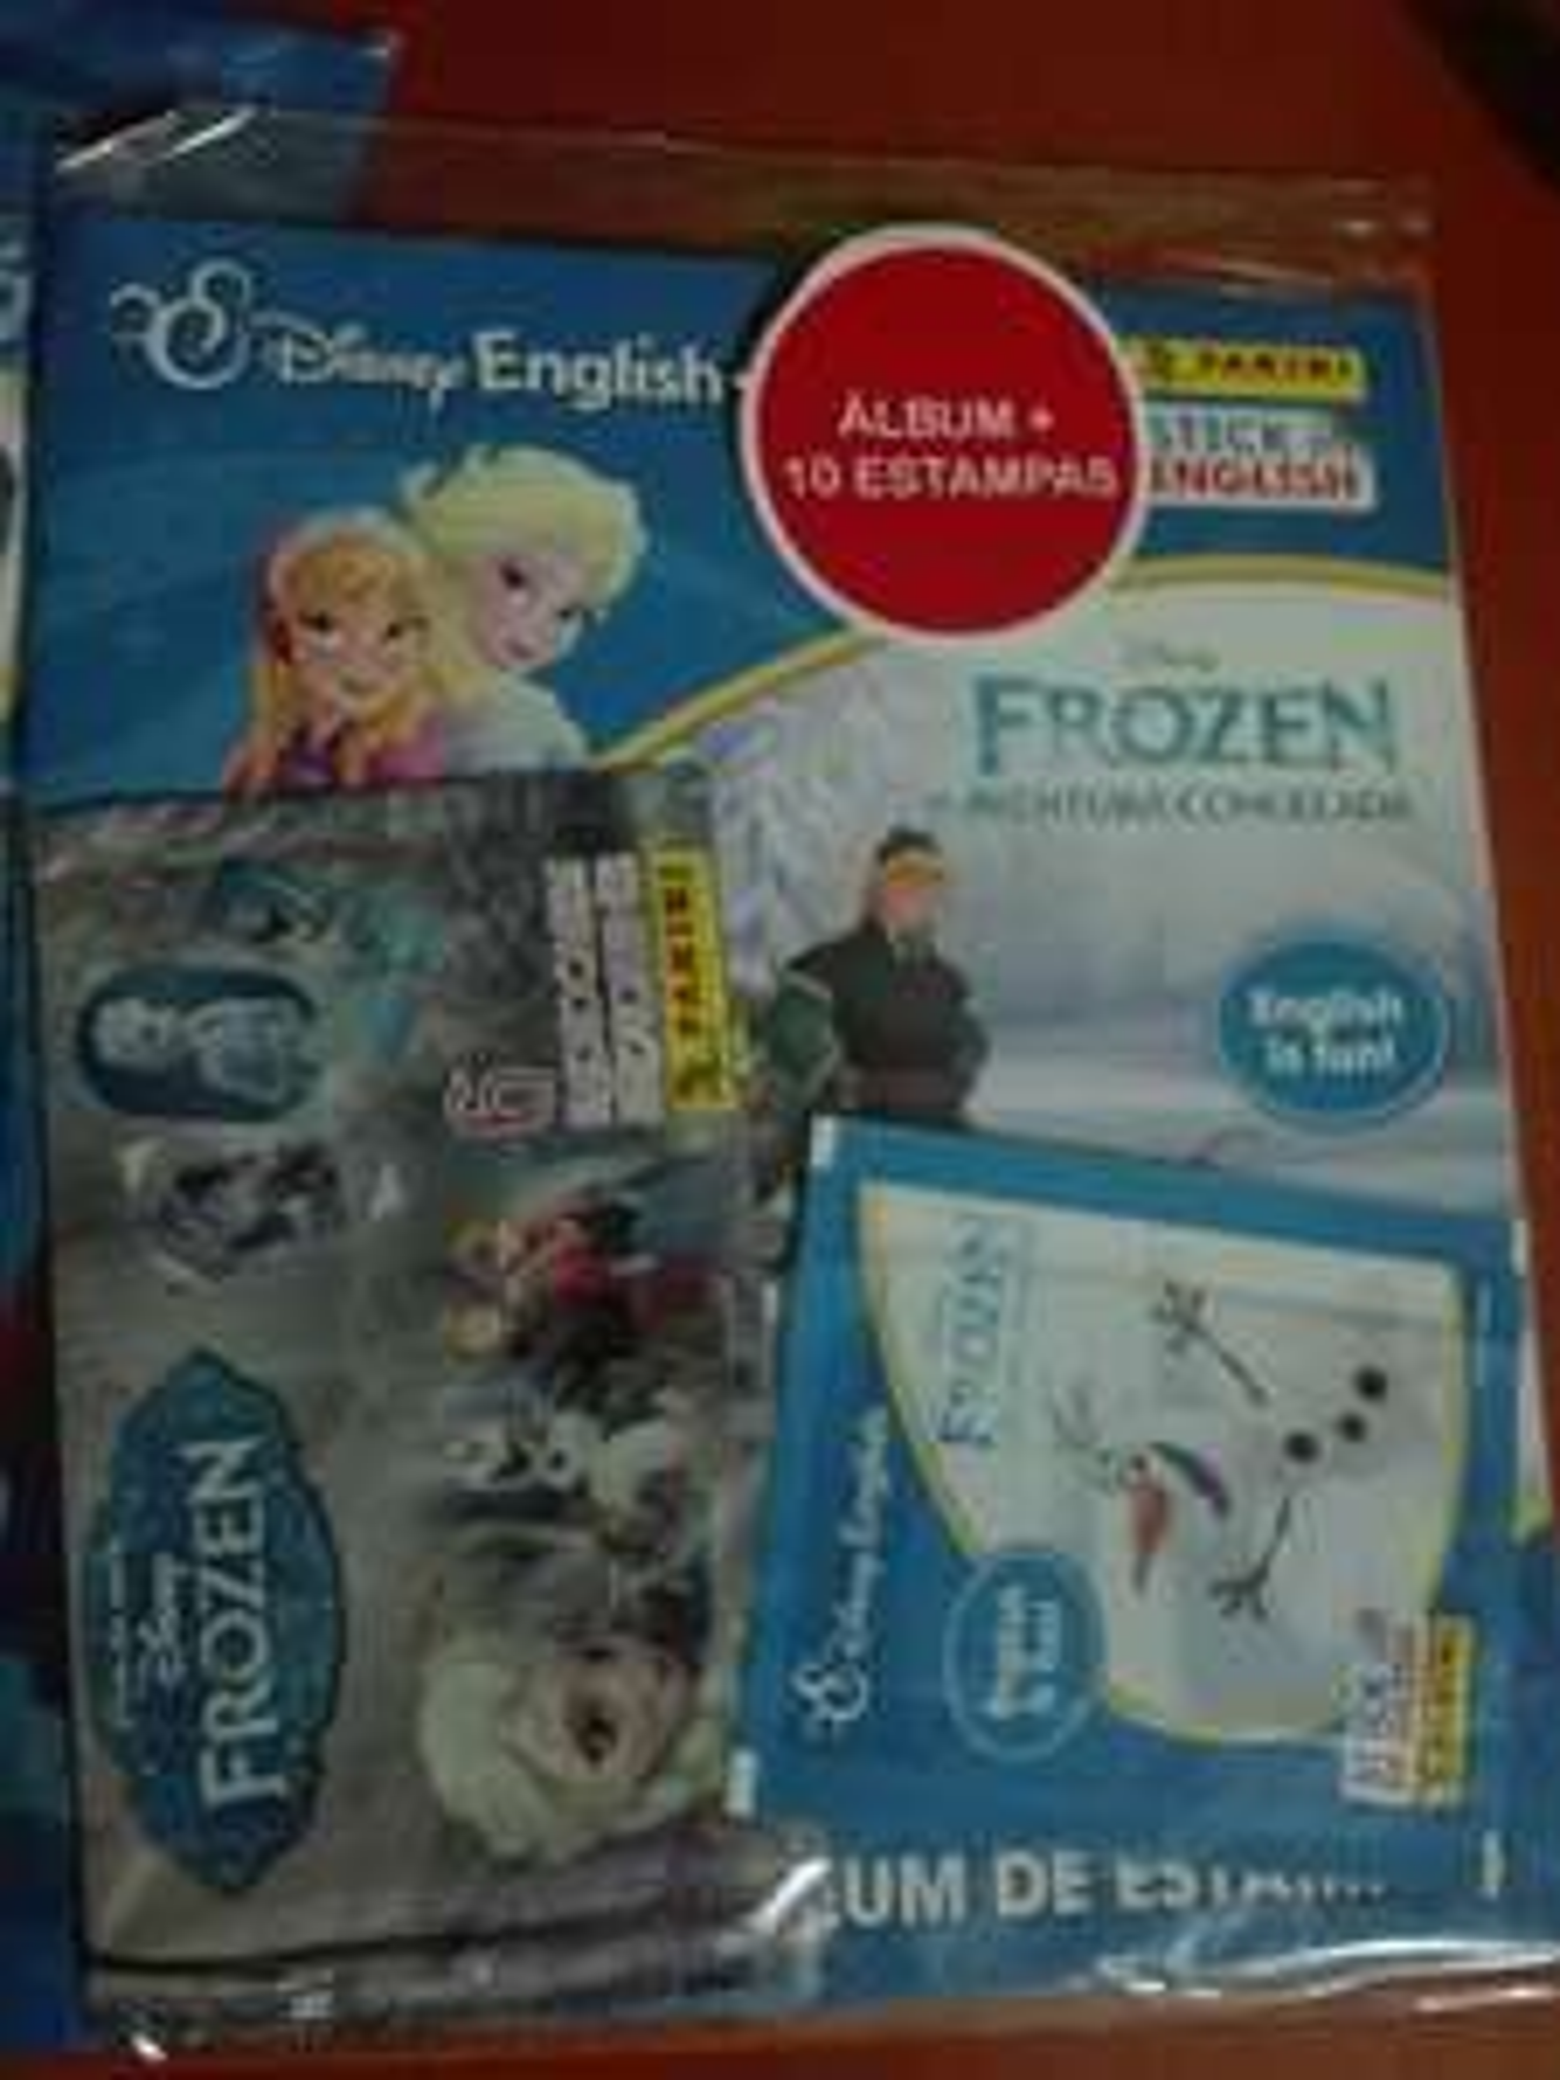 Bodega Aurrerá: Álbum Panini de Frozen + 10 estampas + 6 photocards en liquidación